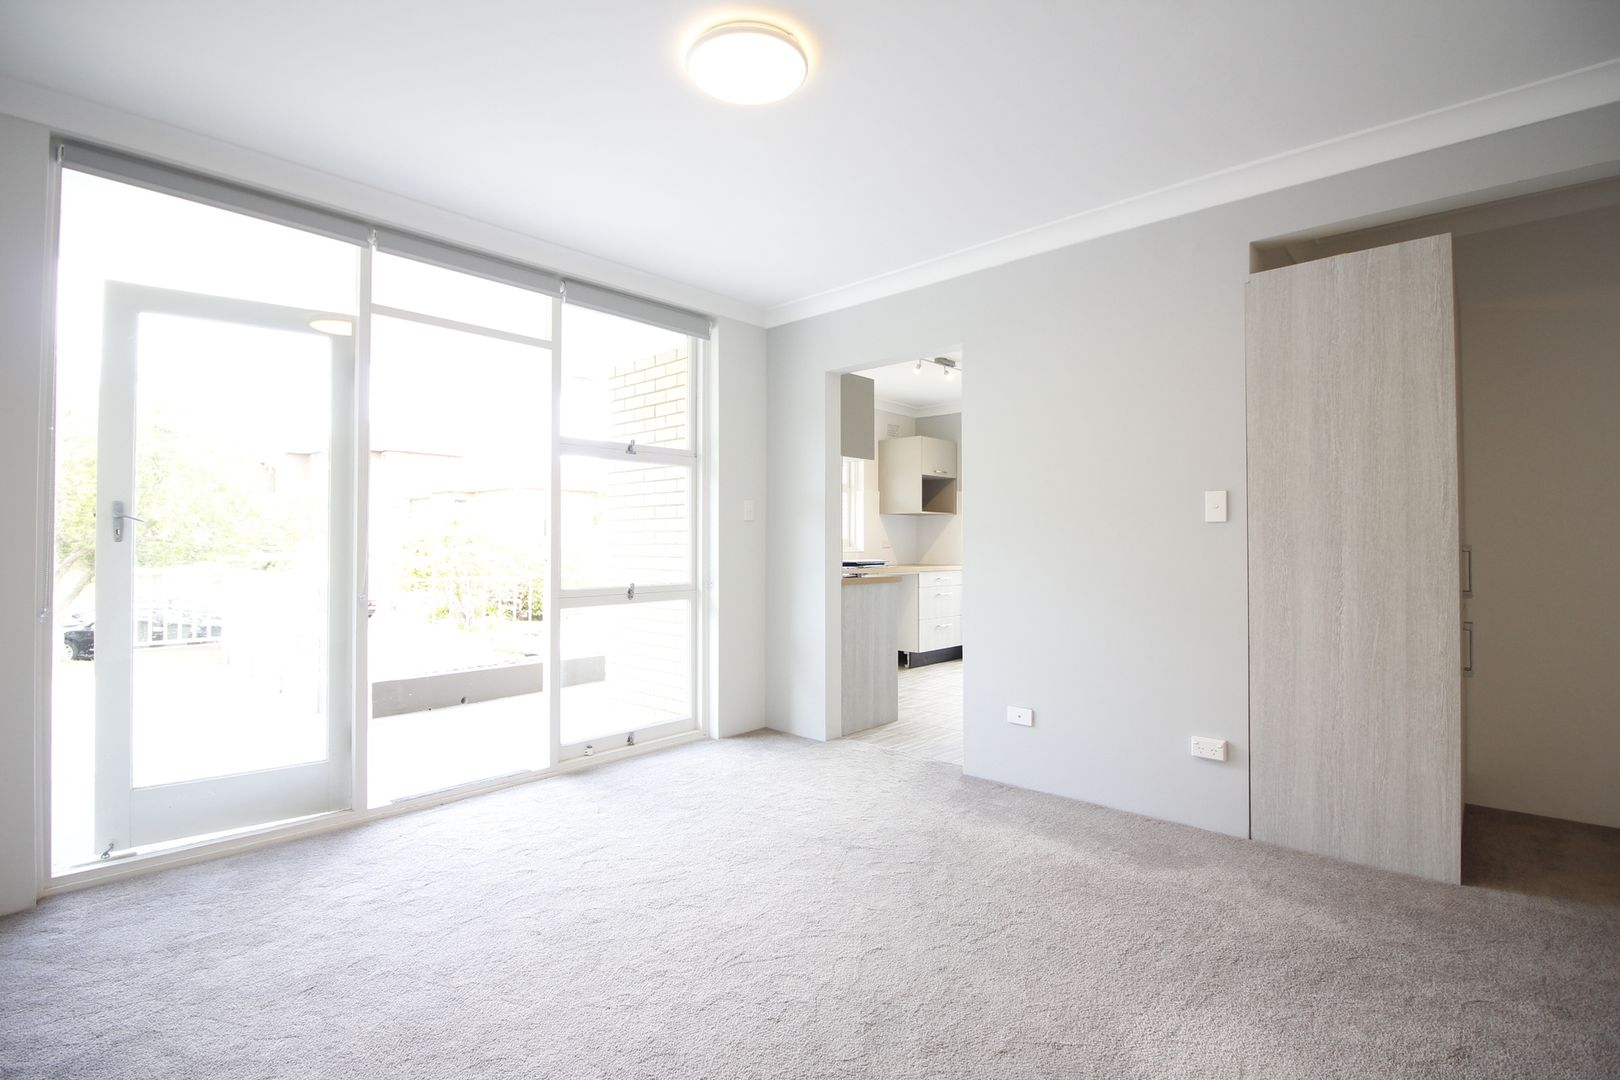 1/11 Boyle Street, Balgowlah NSW 2093, Image 2